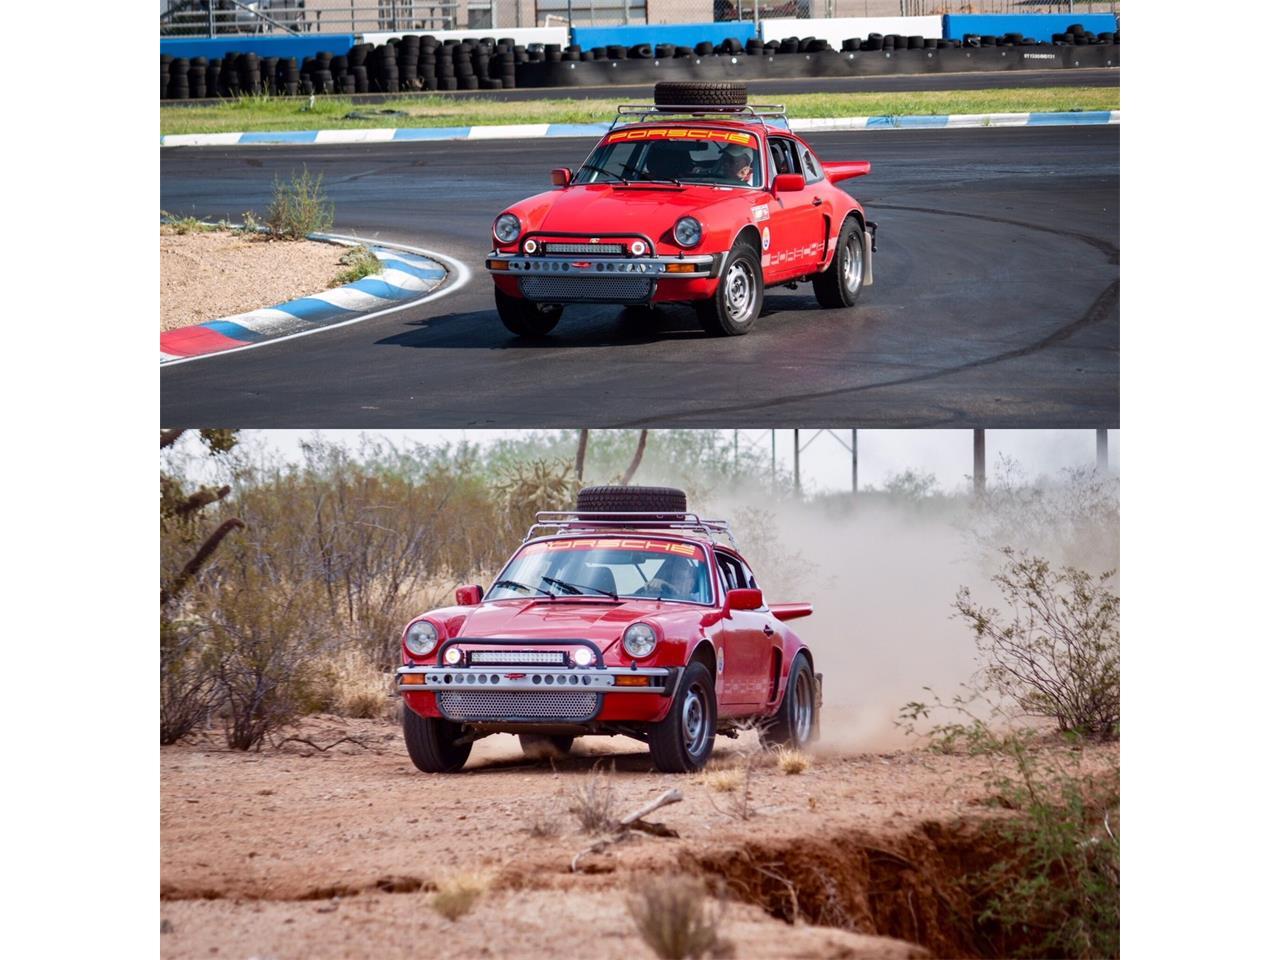 Large Picture of 1979 Porsche 911 located in Tucson Arizona - $75,000.00 - OK7F